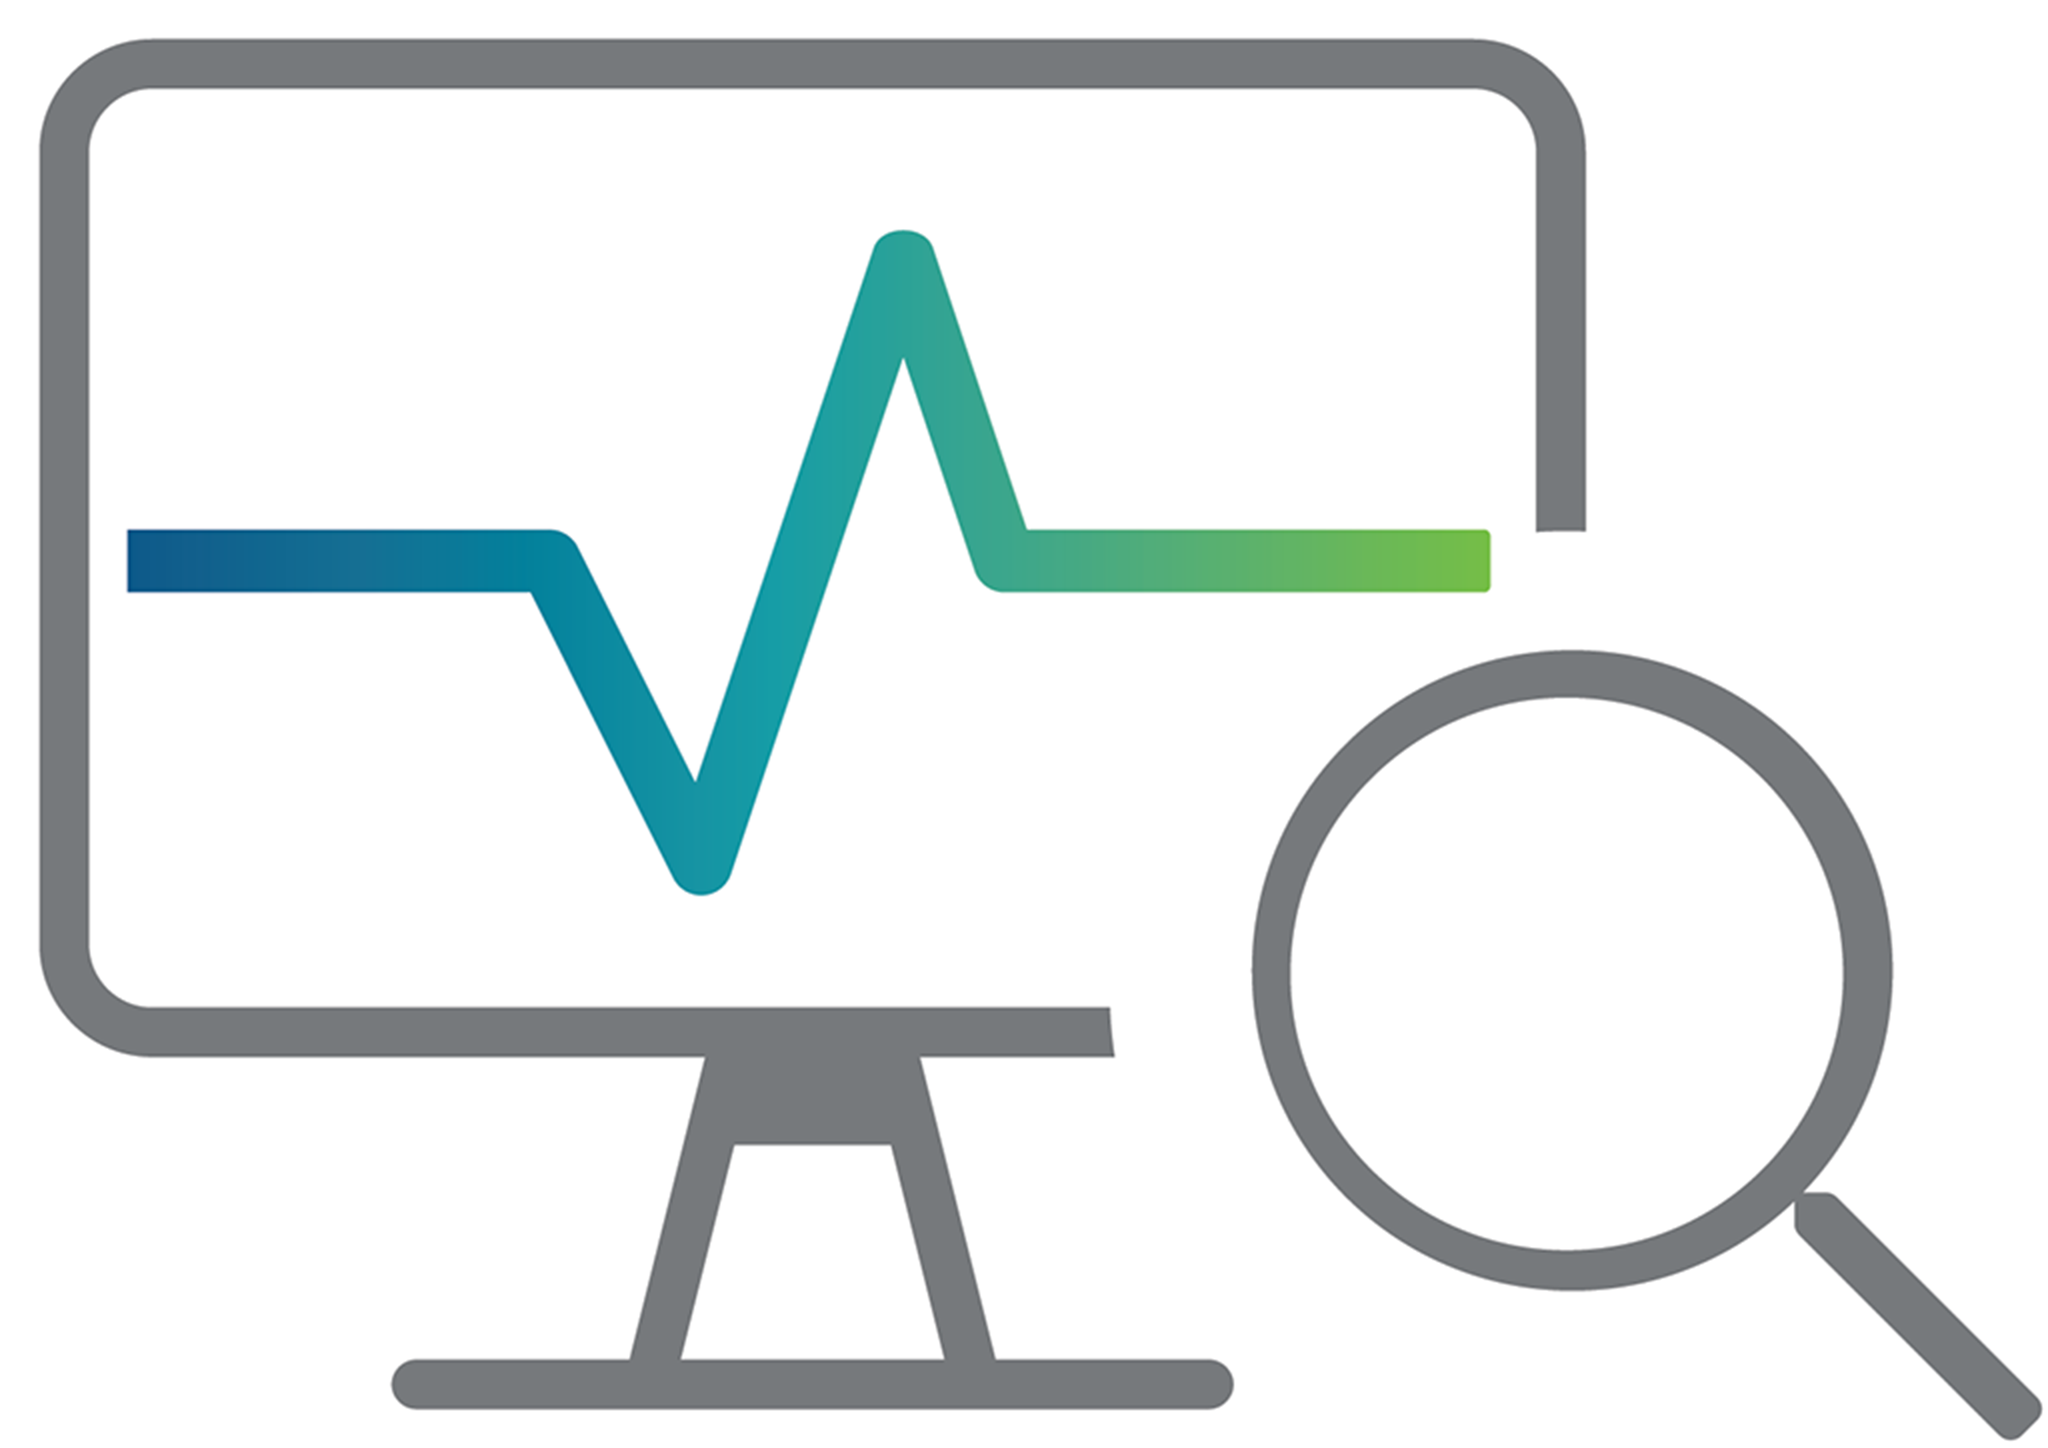 Track Performance through Metrics Reports